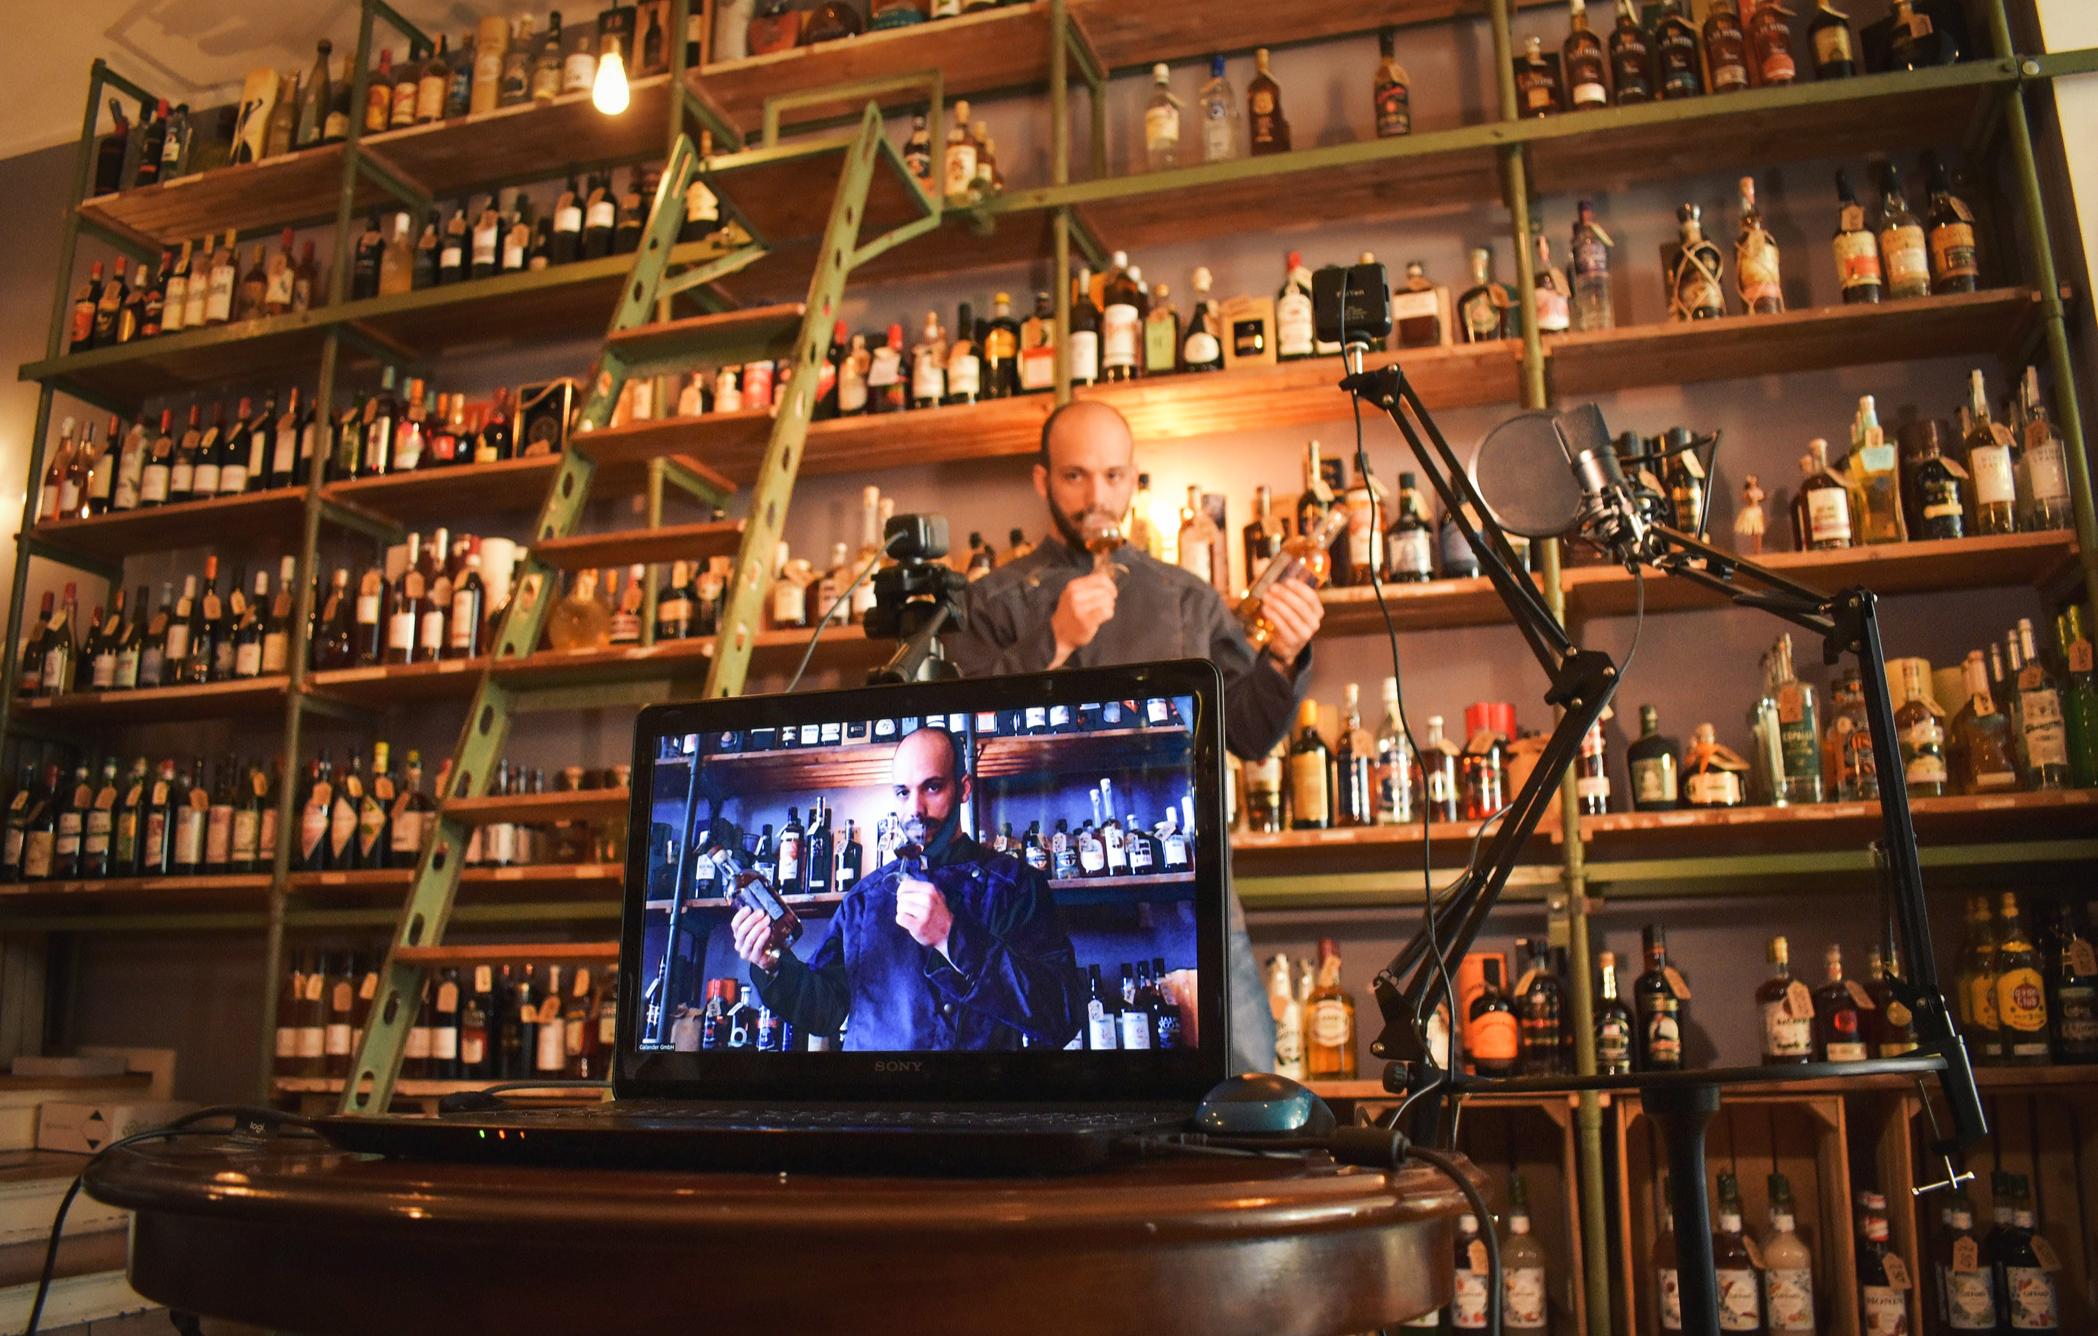 rum-verkostung-online-bg3